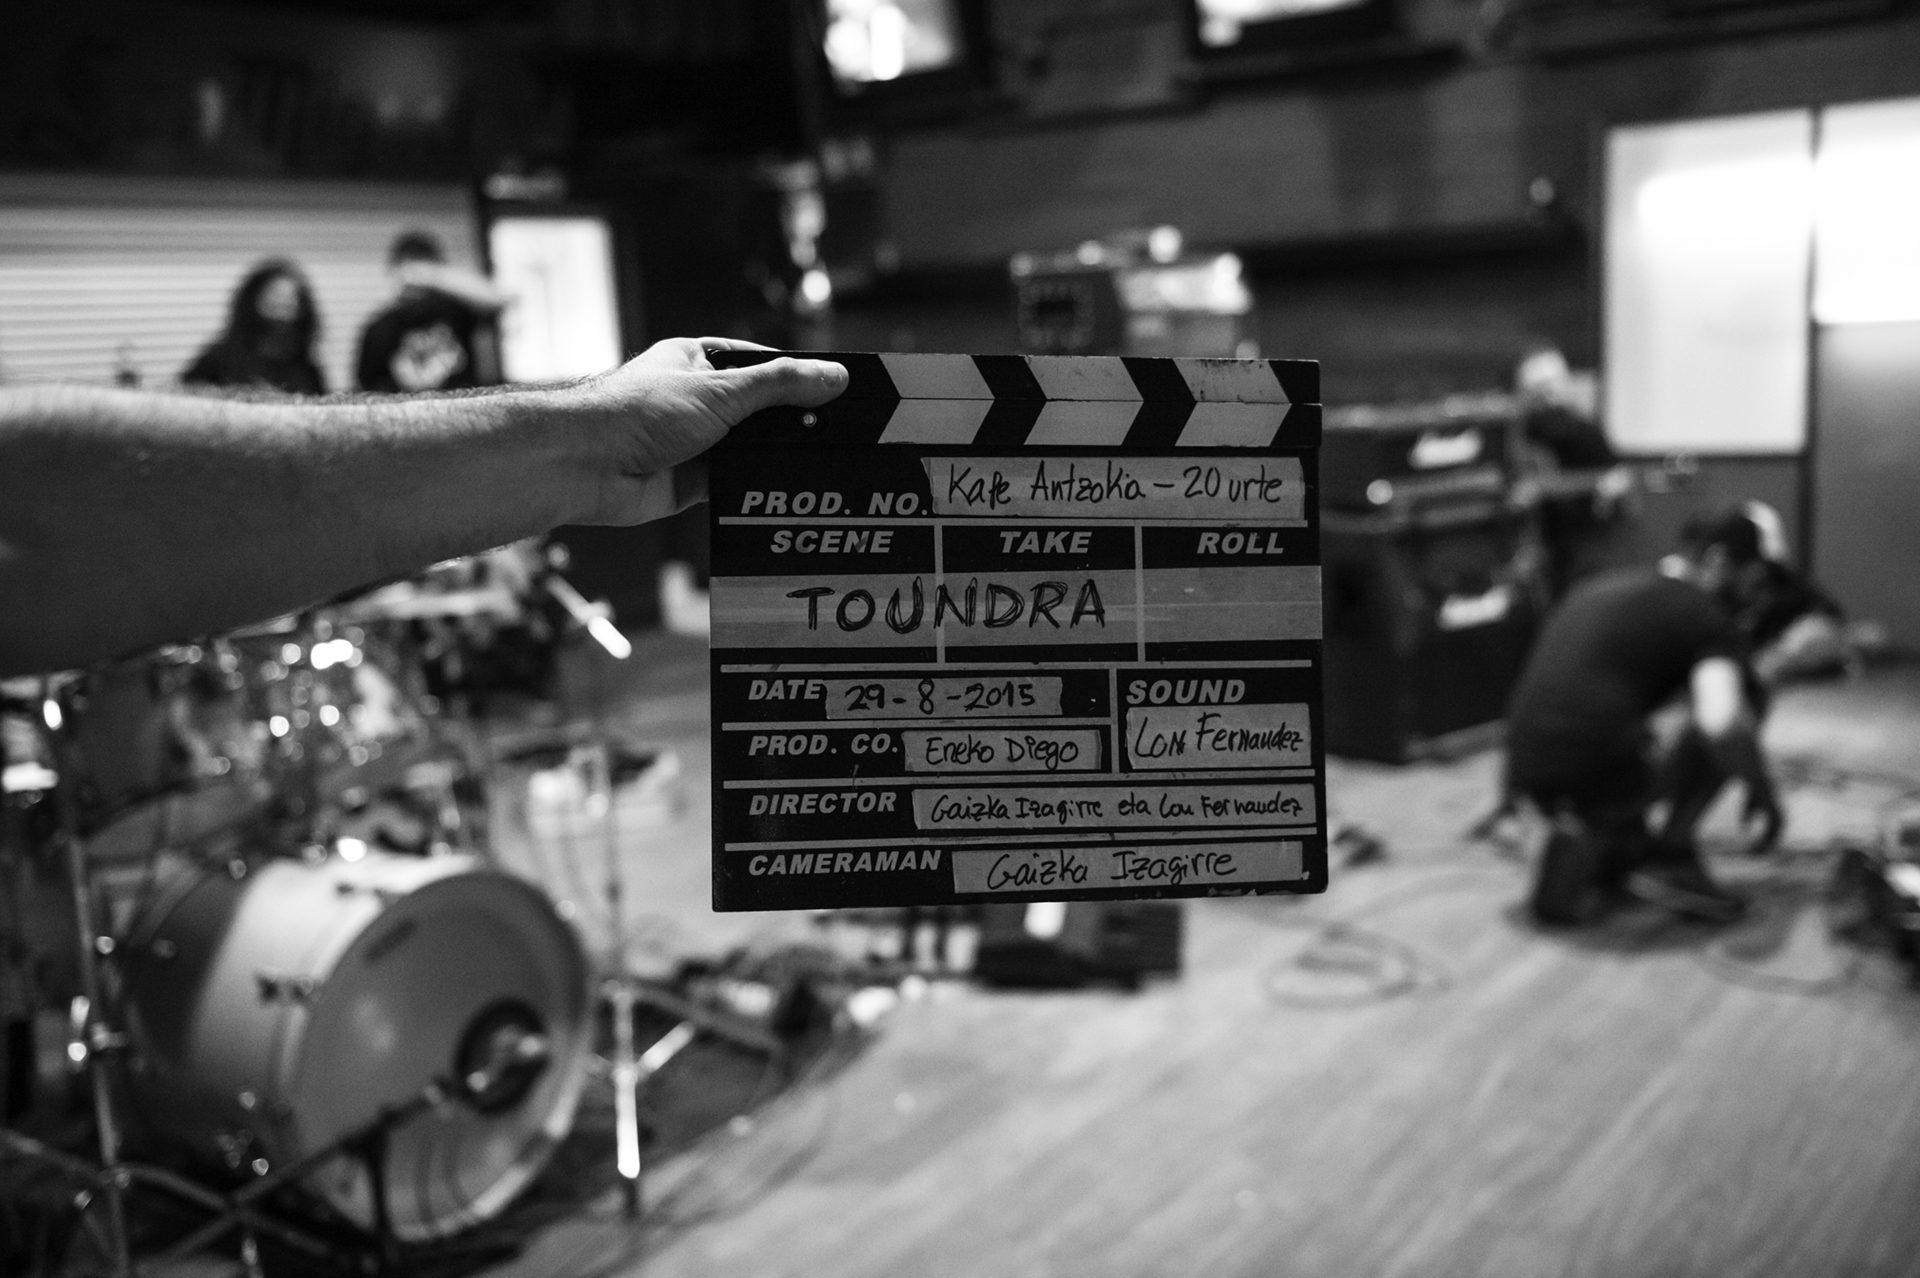 Toundra_11